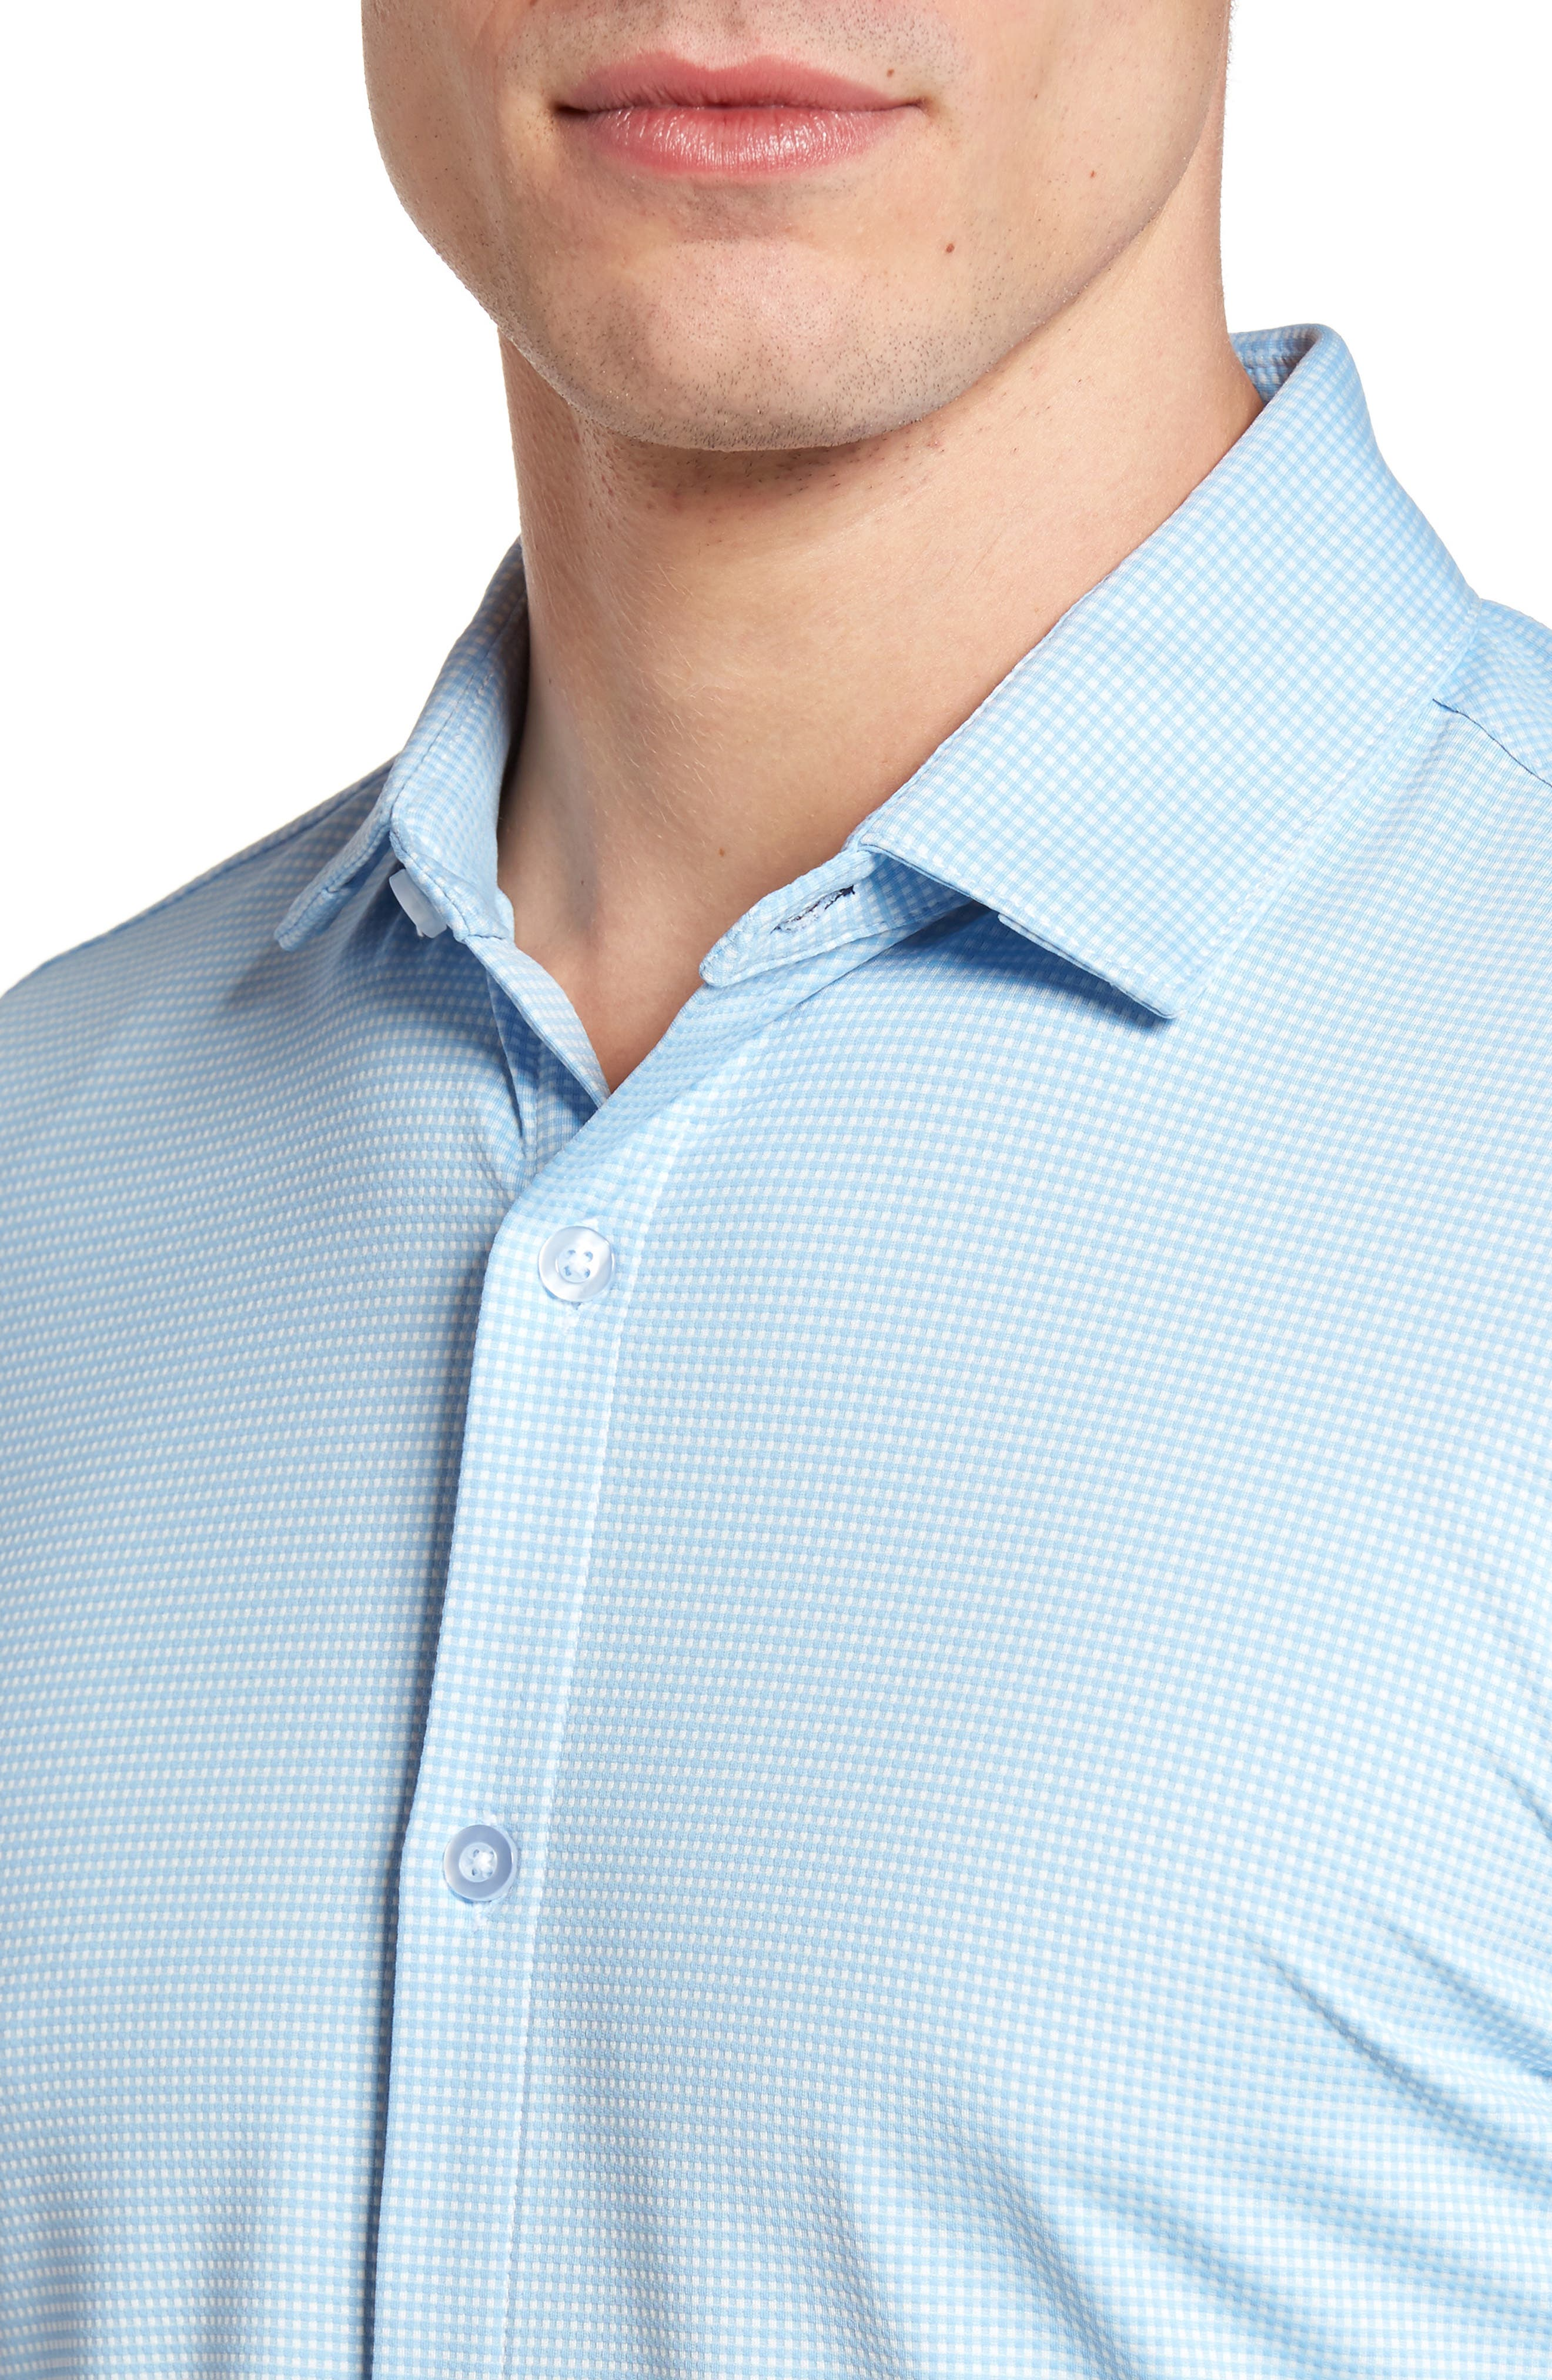 MIZZEN+MAIN, Whitman Trim Fit Dobby Gingham Performance Sport Shirt, Alternate thumbnail 4, color, BLUE